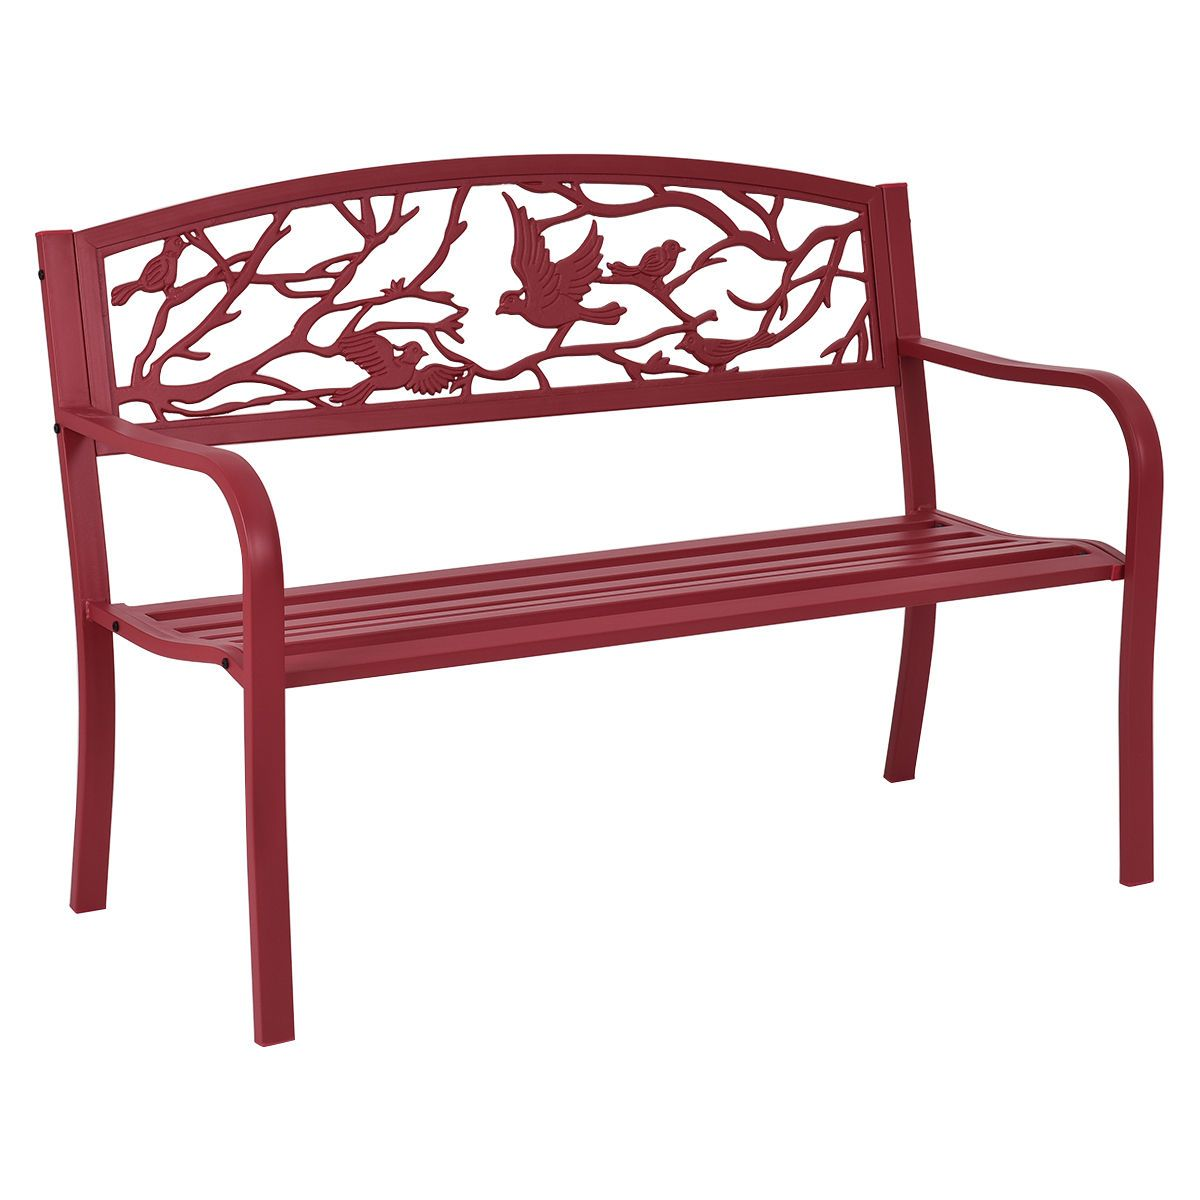 Patio Garden Bench Park Yard Outdoor Furniture Outdoor Living Patio Outdoor Living Furniture Patio Furniture Sets